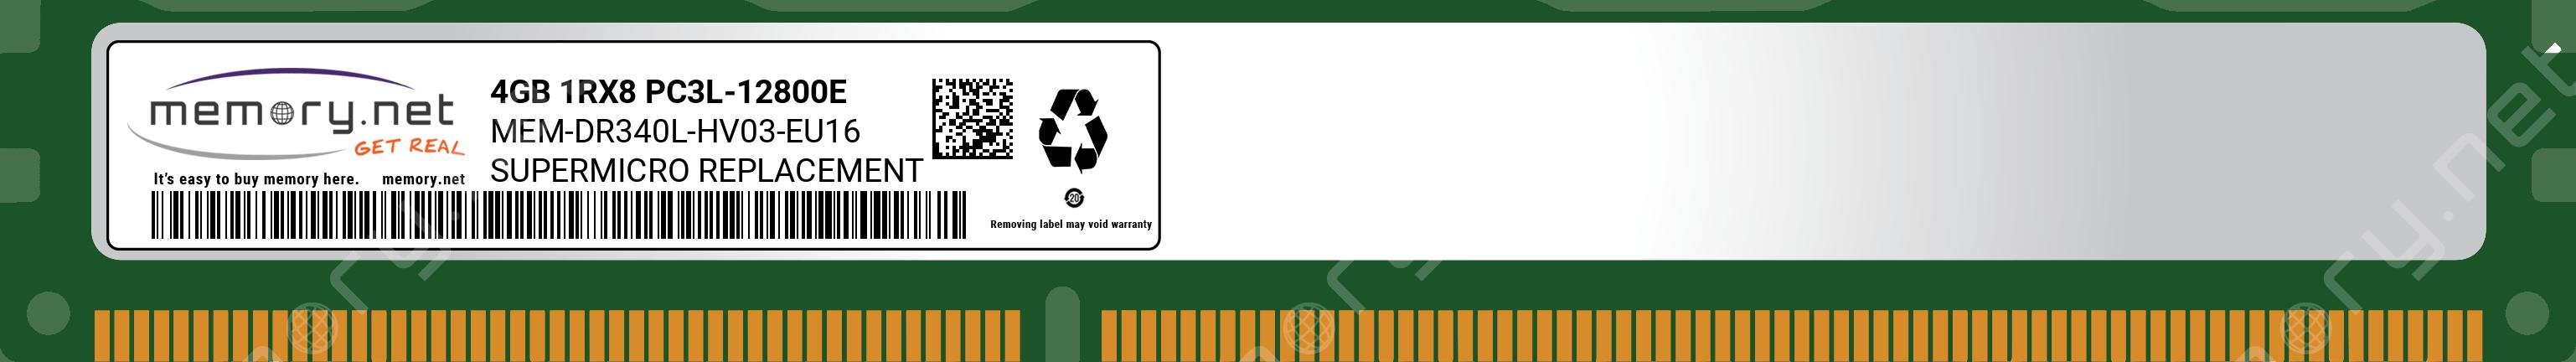 MEM-DR340L-HV03-EU16